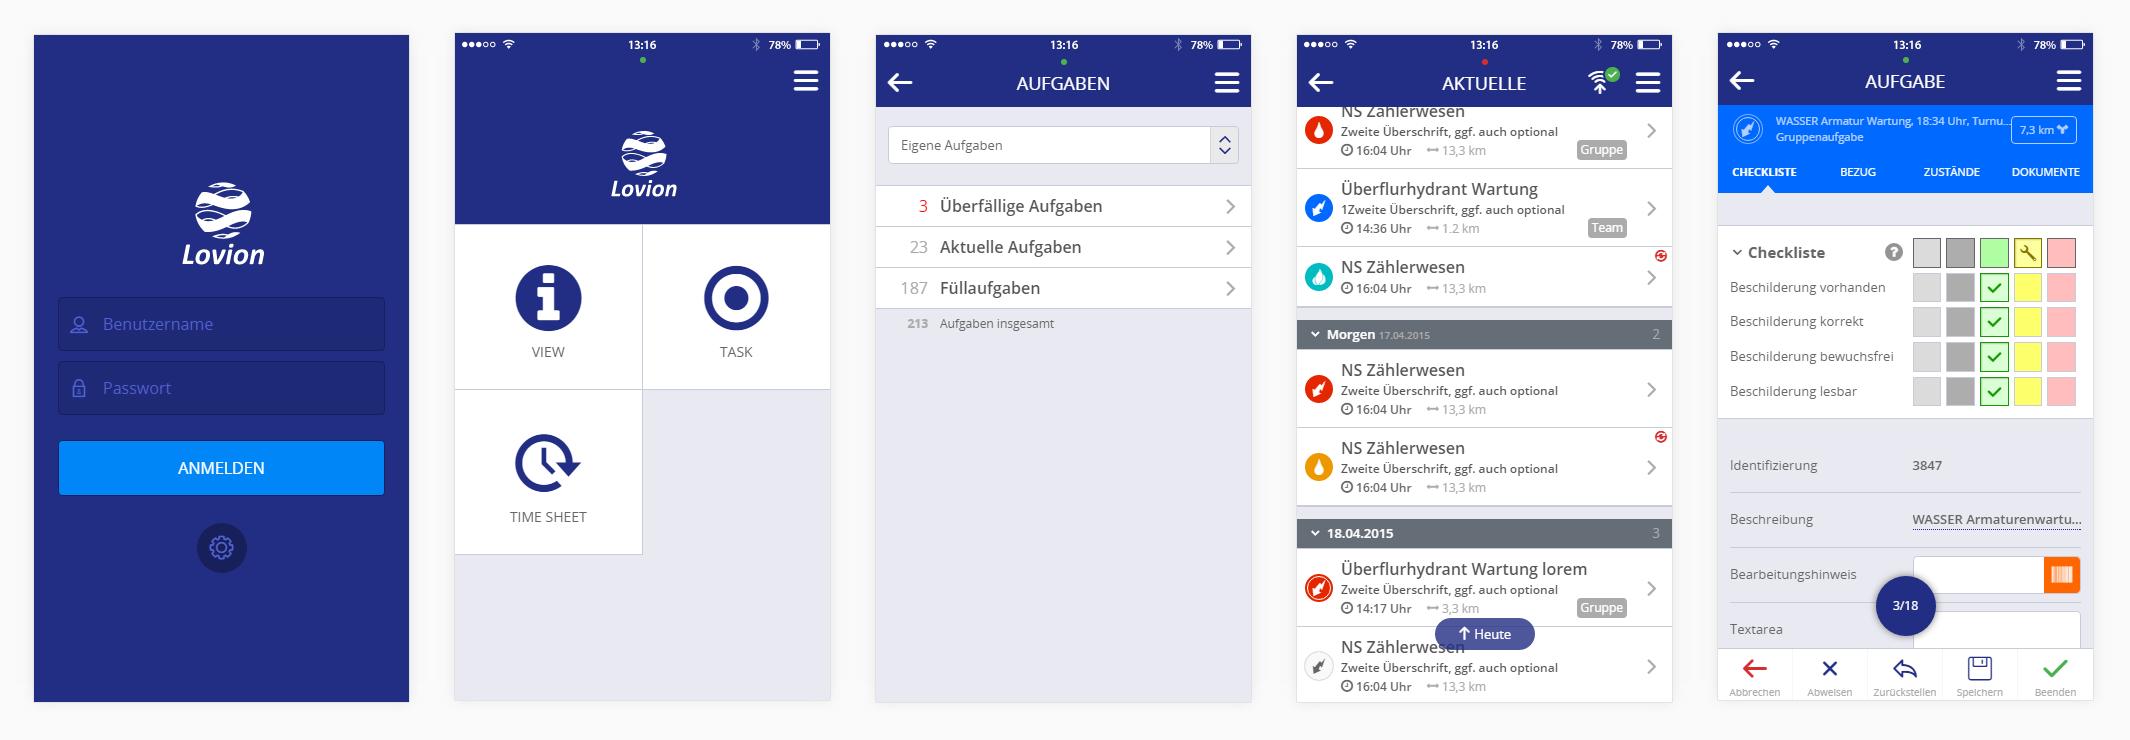 lovion_task_app-collage